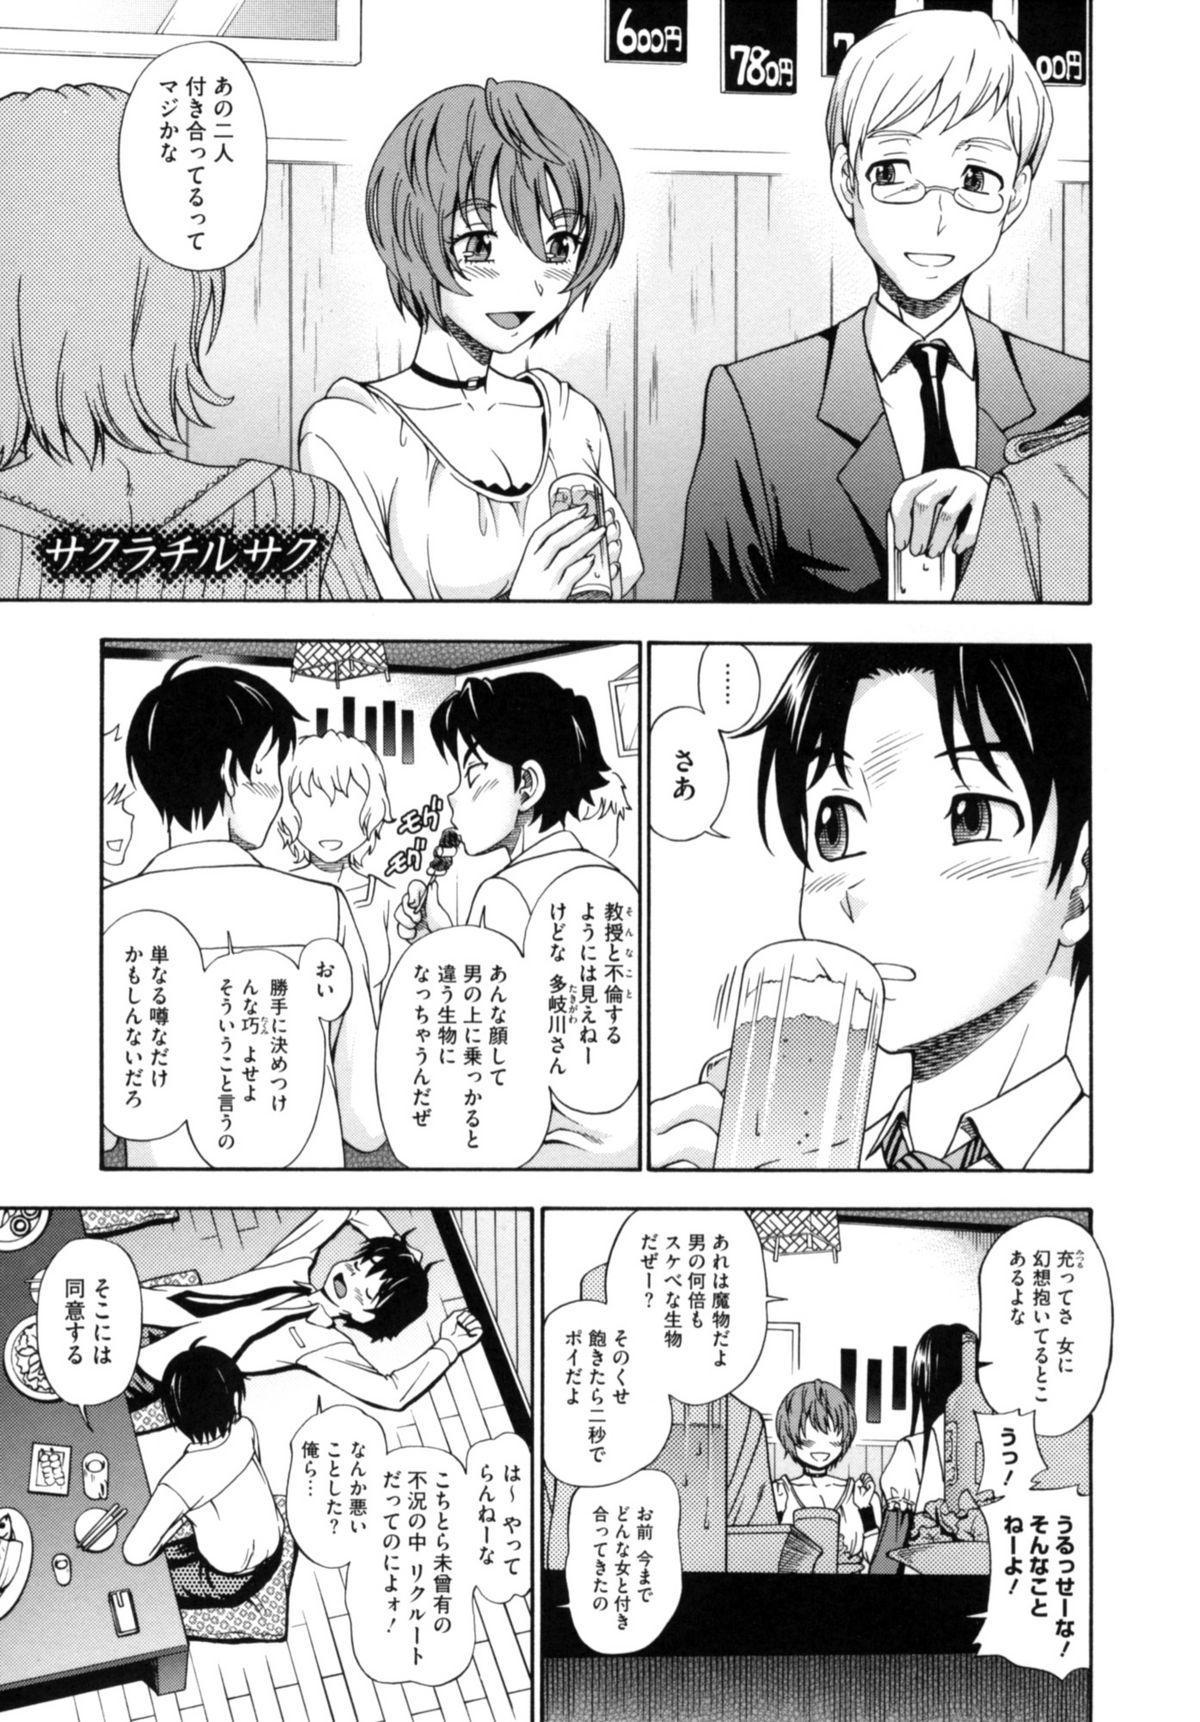 Soushisouai Note Nisatsume 120